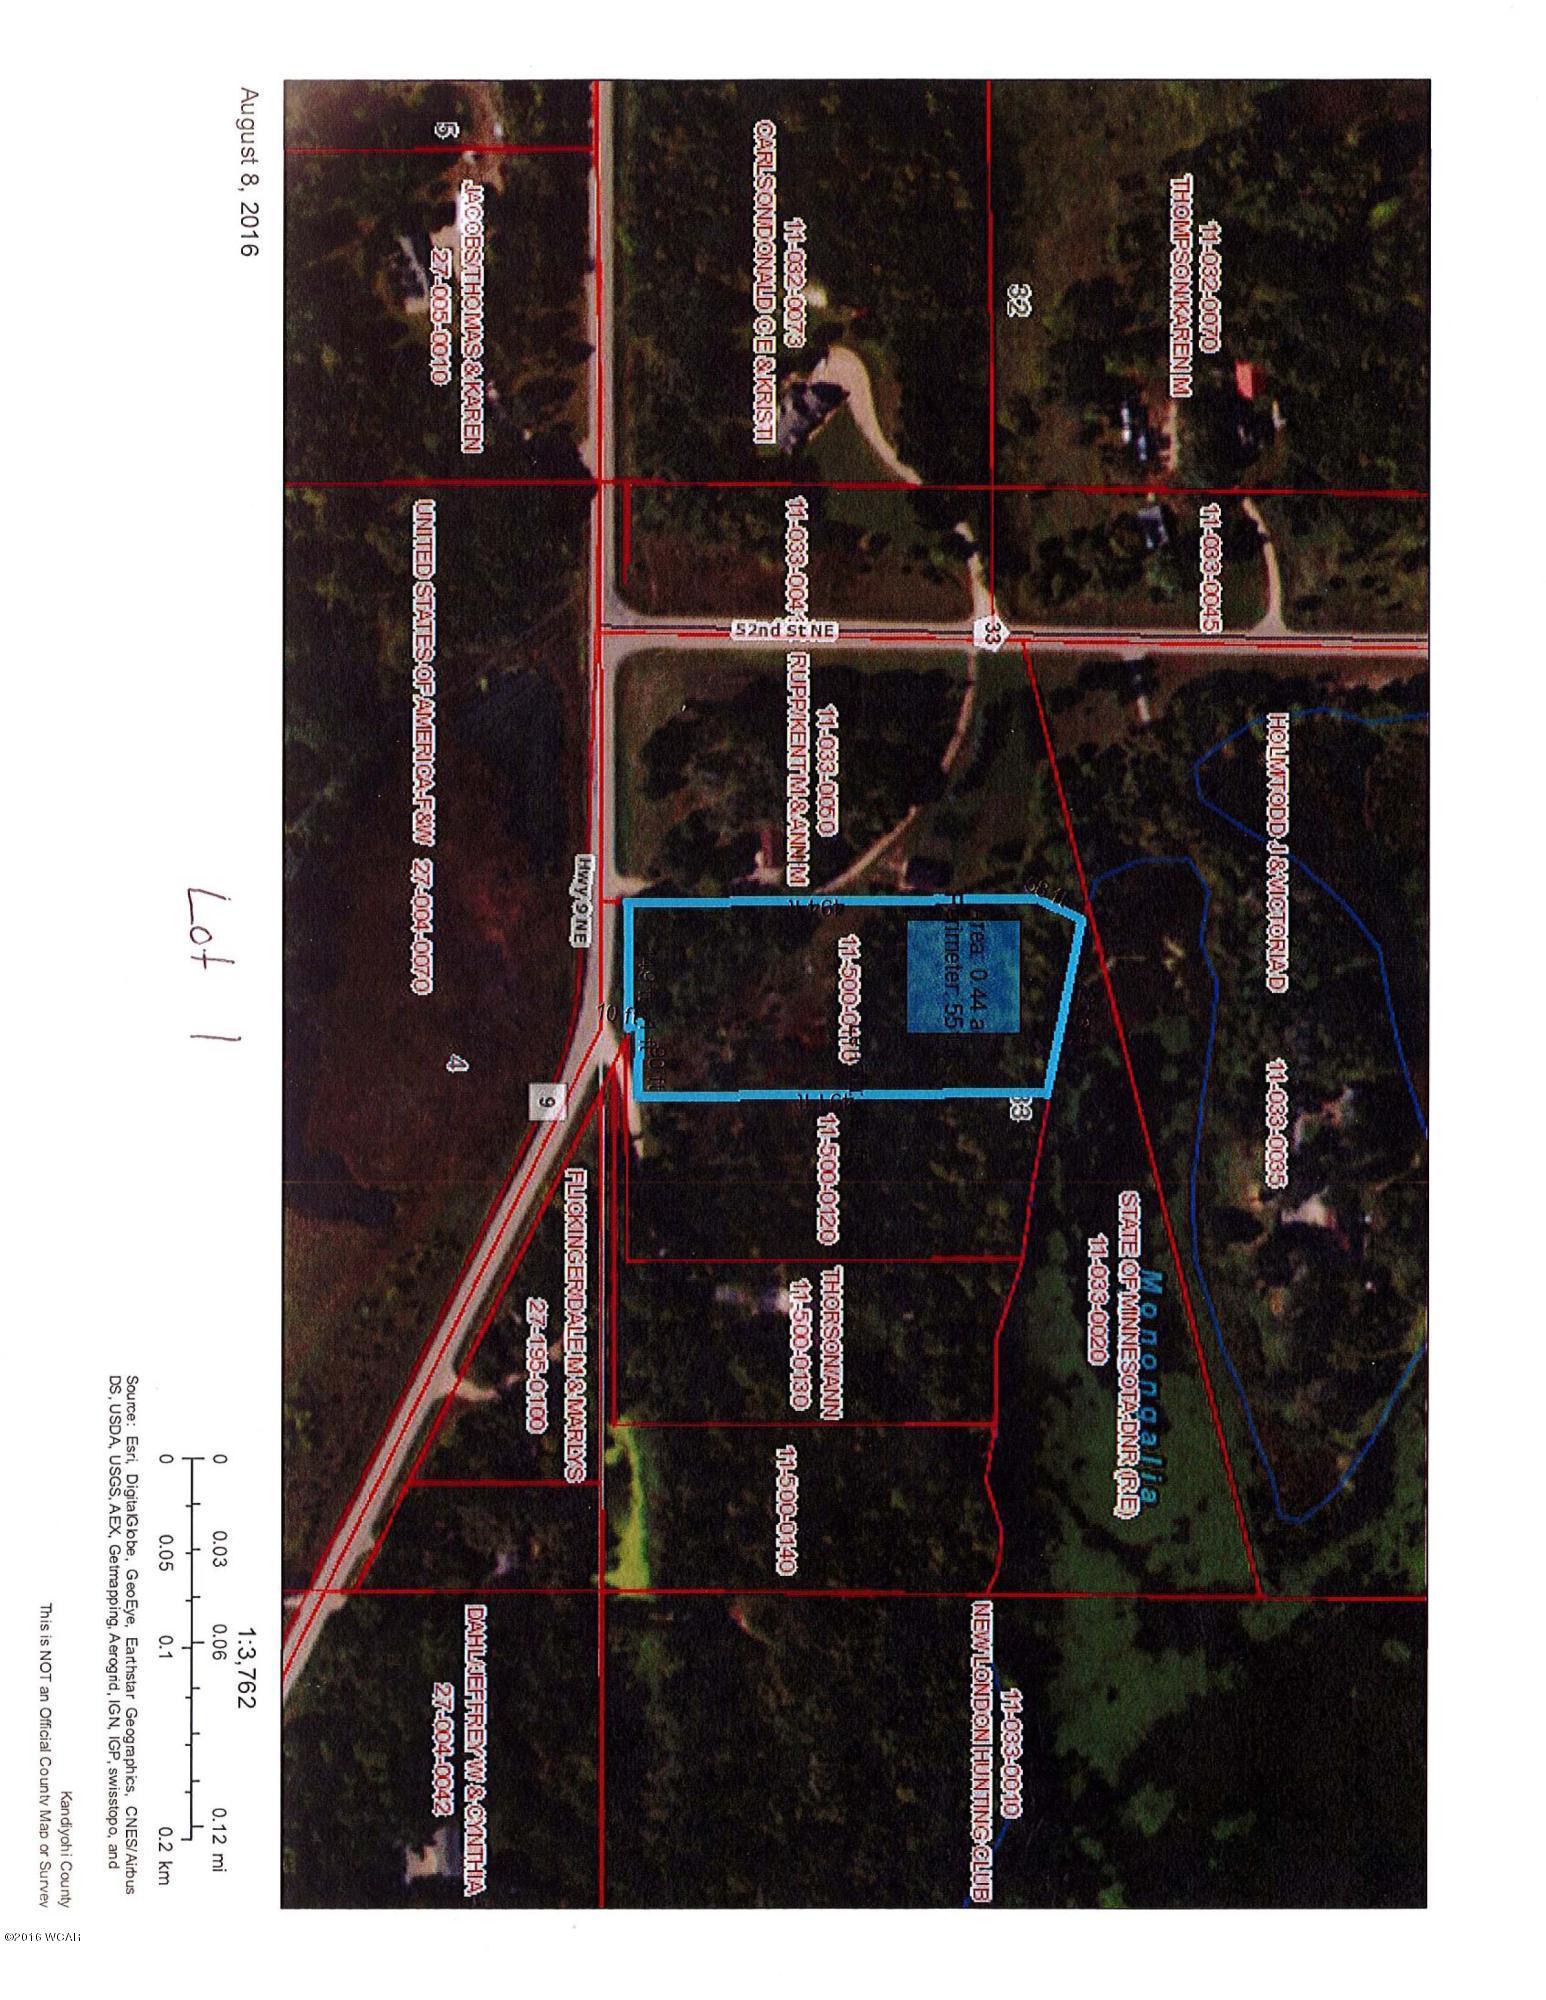 Xxx Hwy 9,New London,Residential Land,Hwy 9,6024403